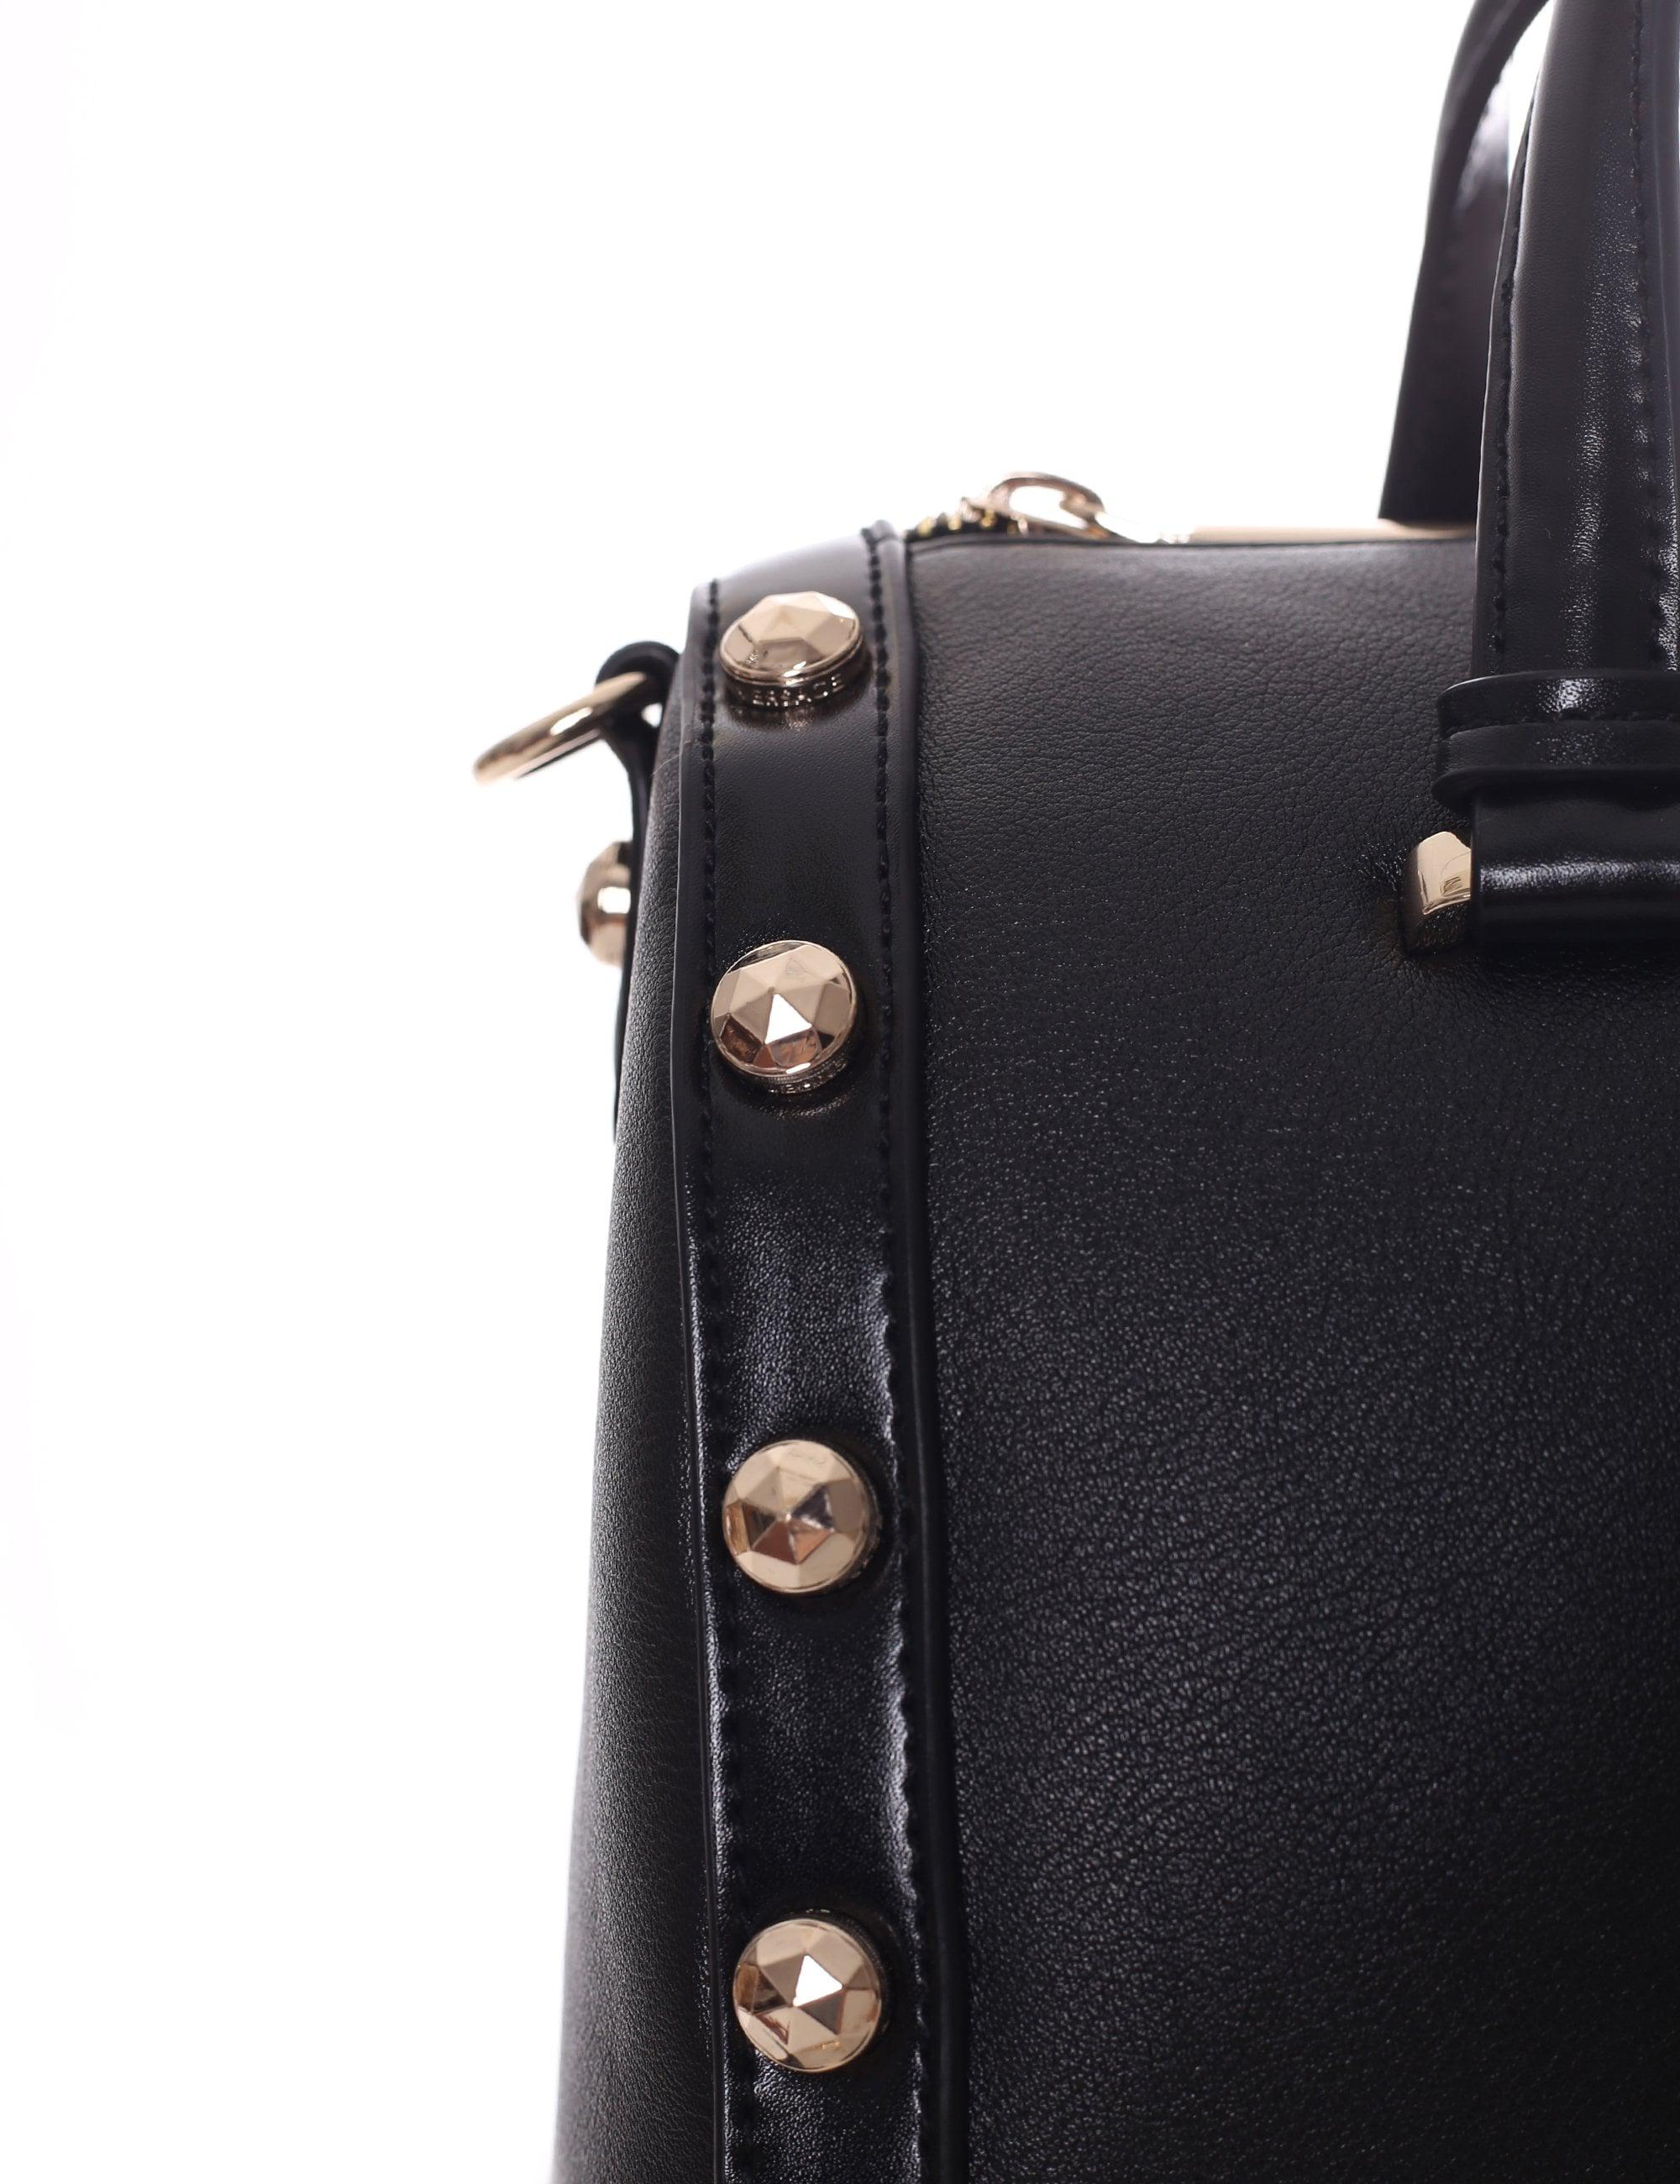 75bed4c4c88d7 Versace Jeans Large Stud Bowler Bag in Black - Lyst